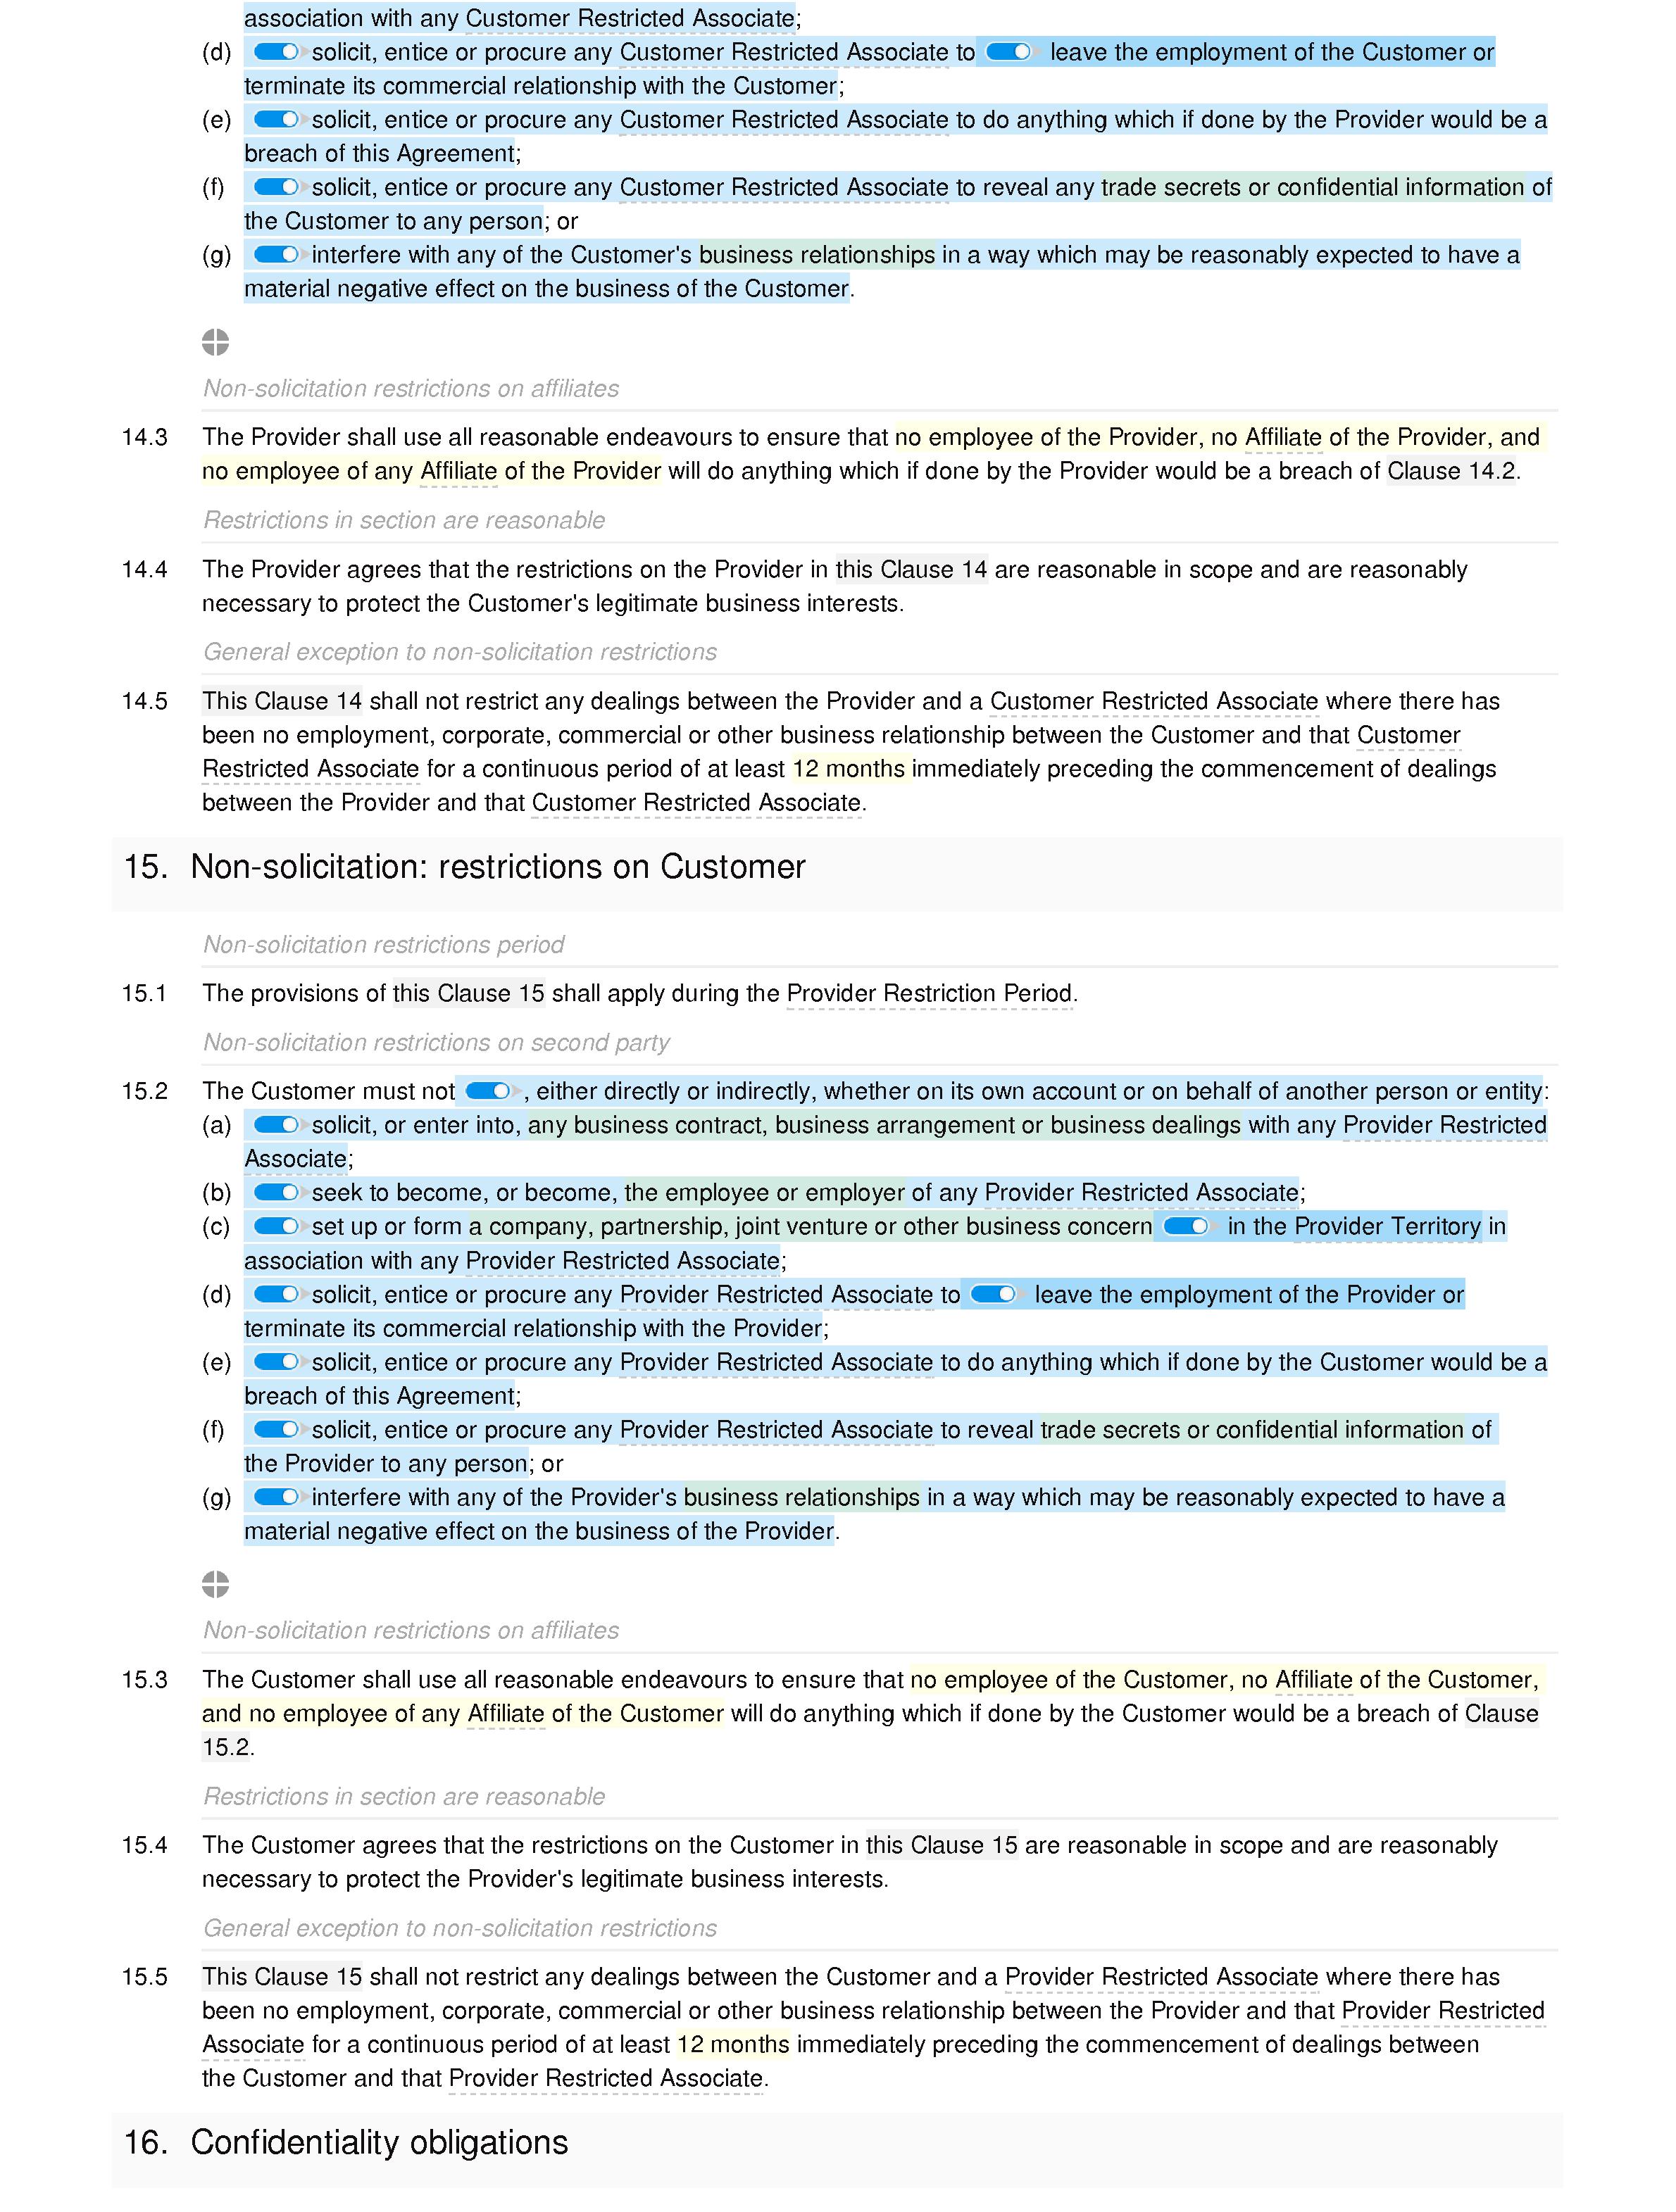 Services Agreement Premium Docular